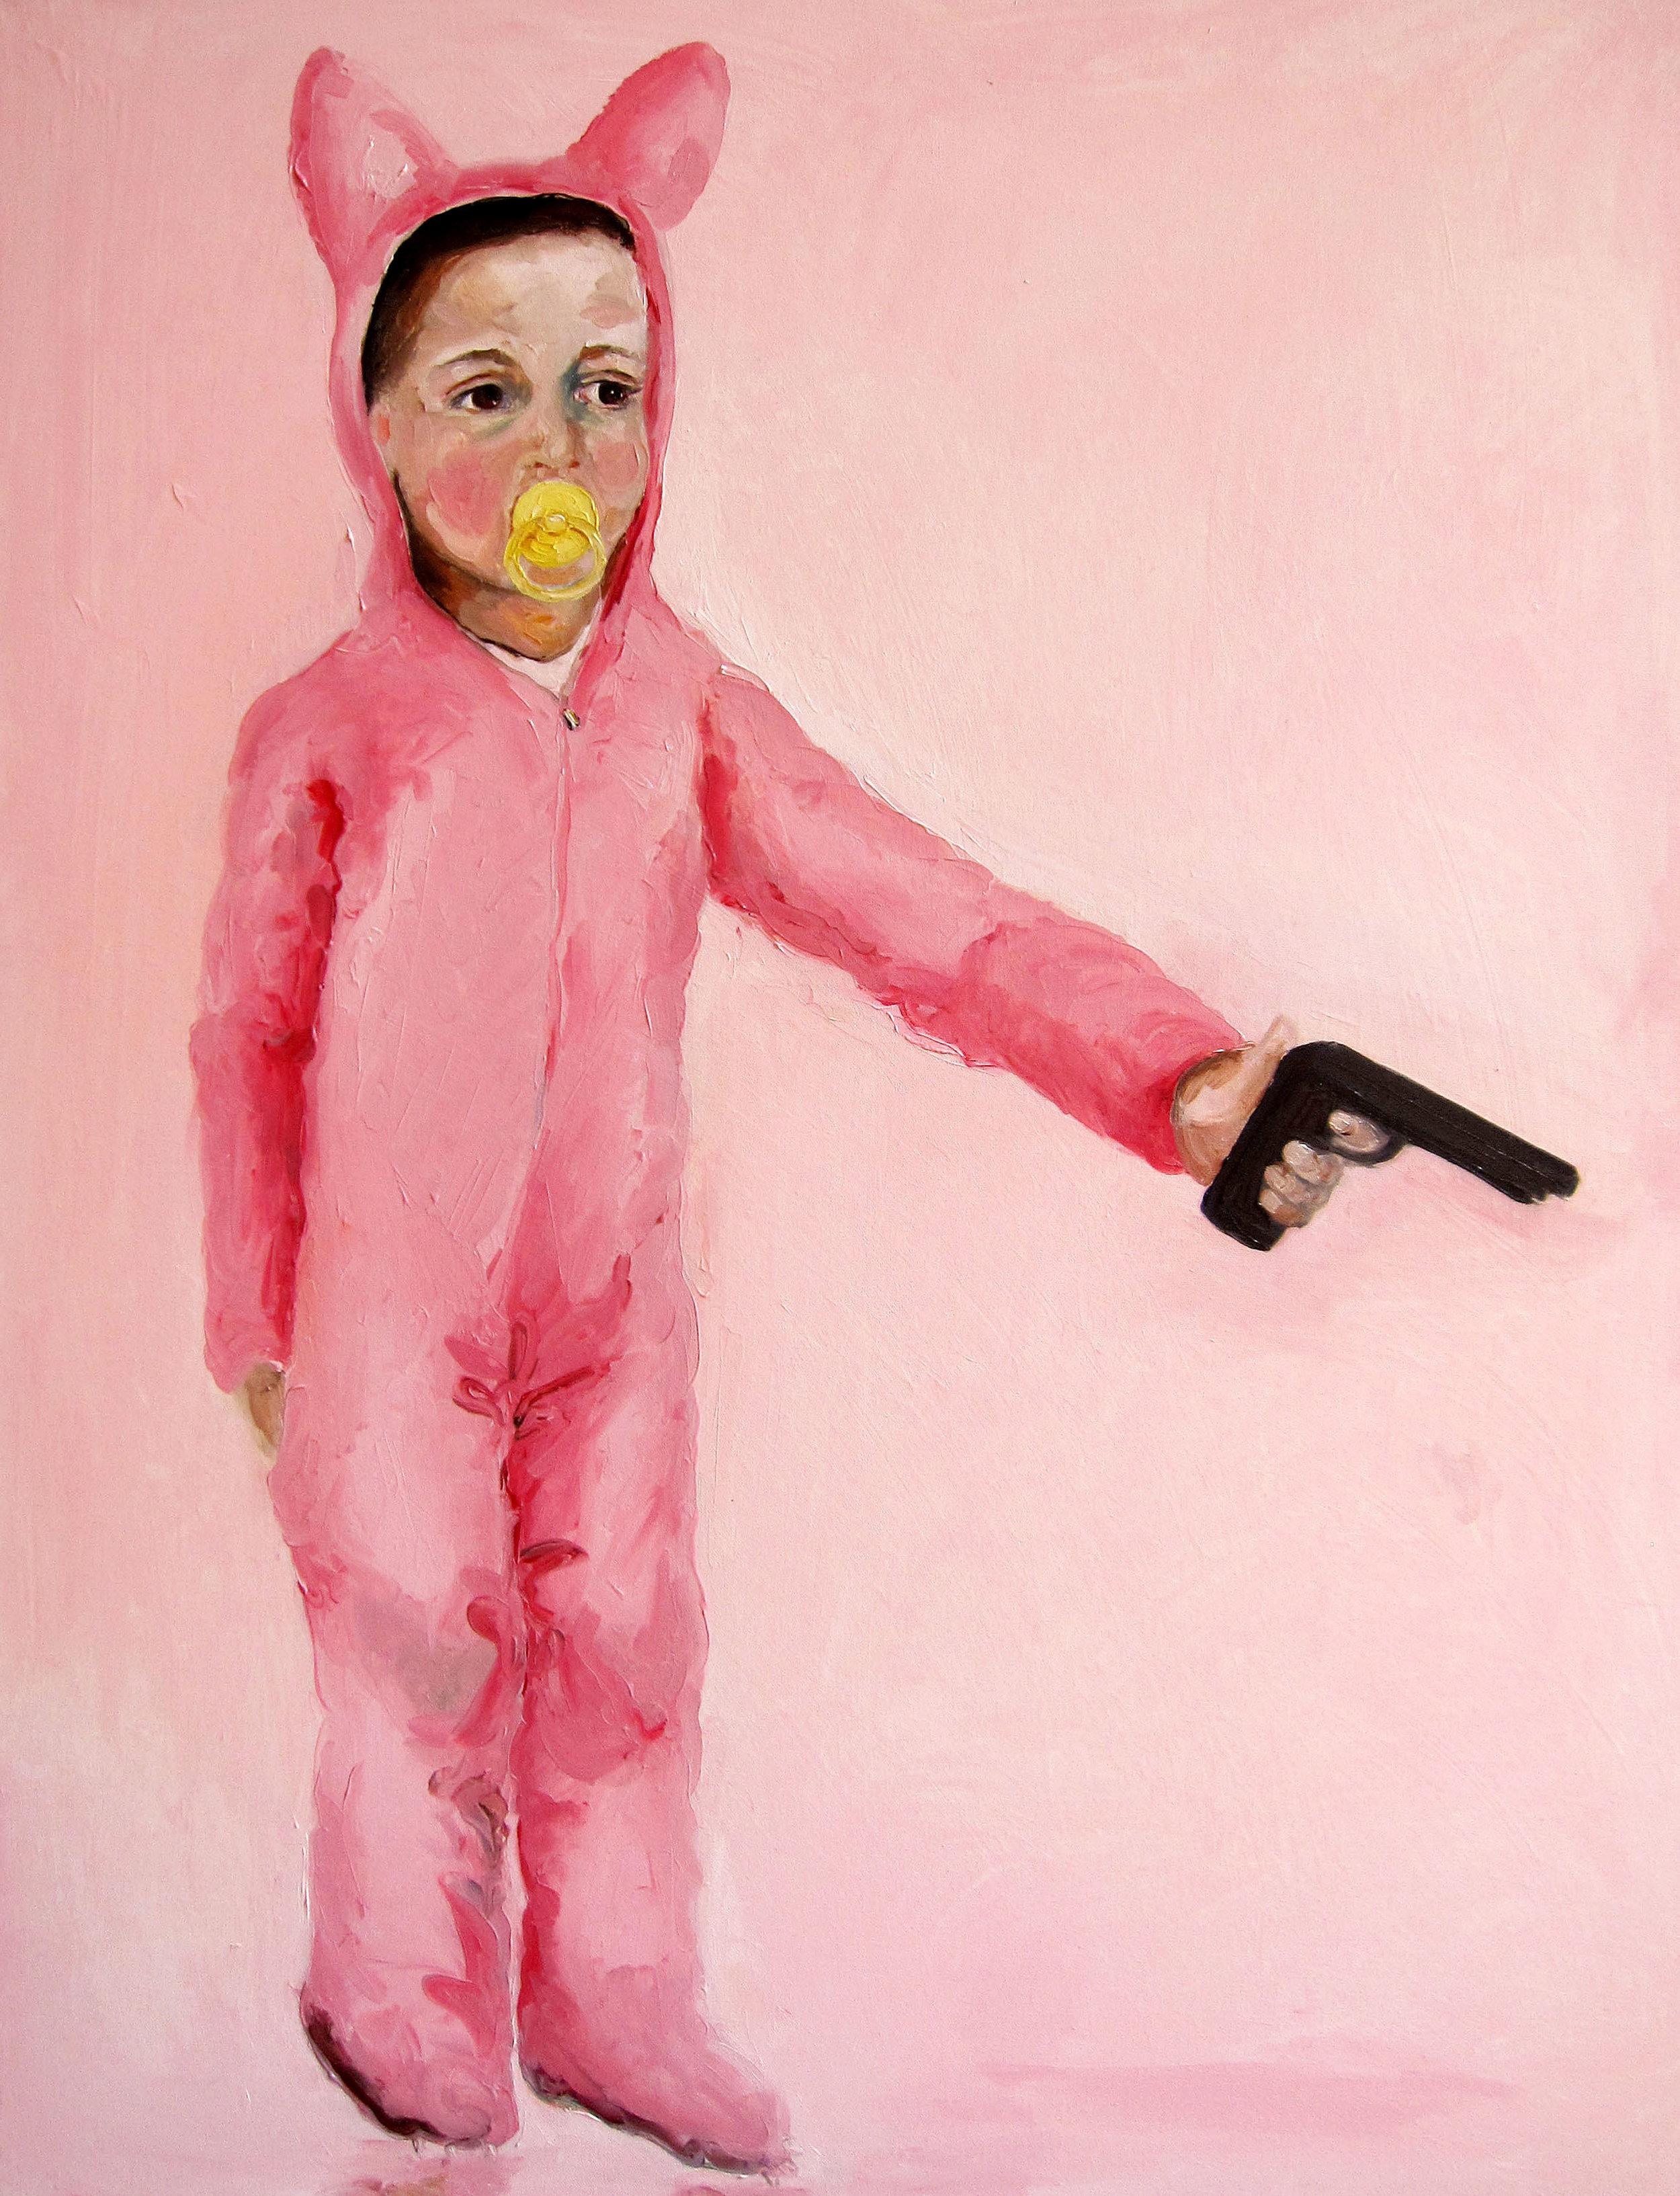 Chupon Amarillo, 2013, Oil on canvas, 40 x 30 in.